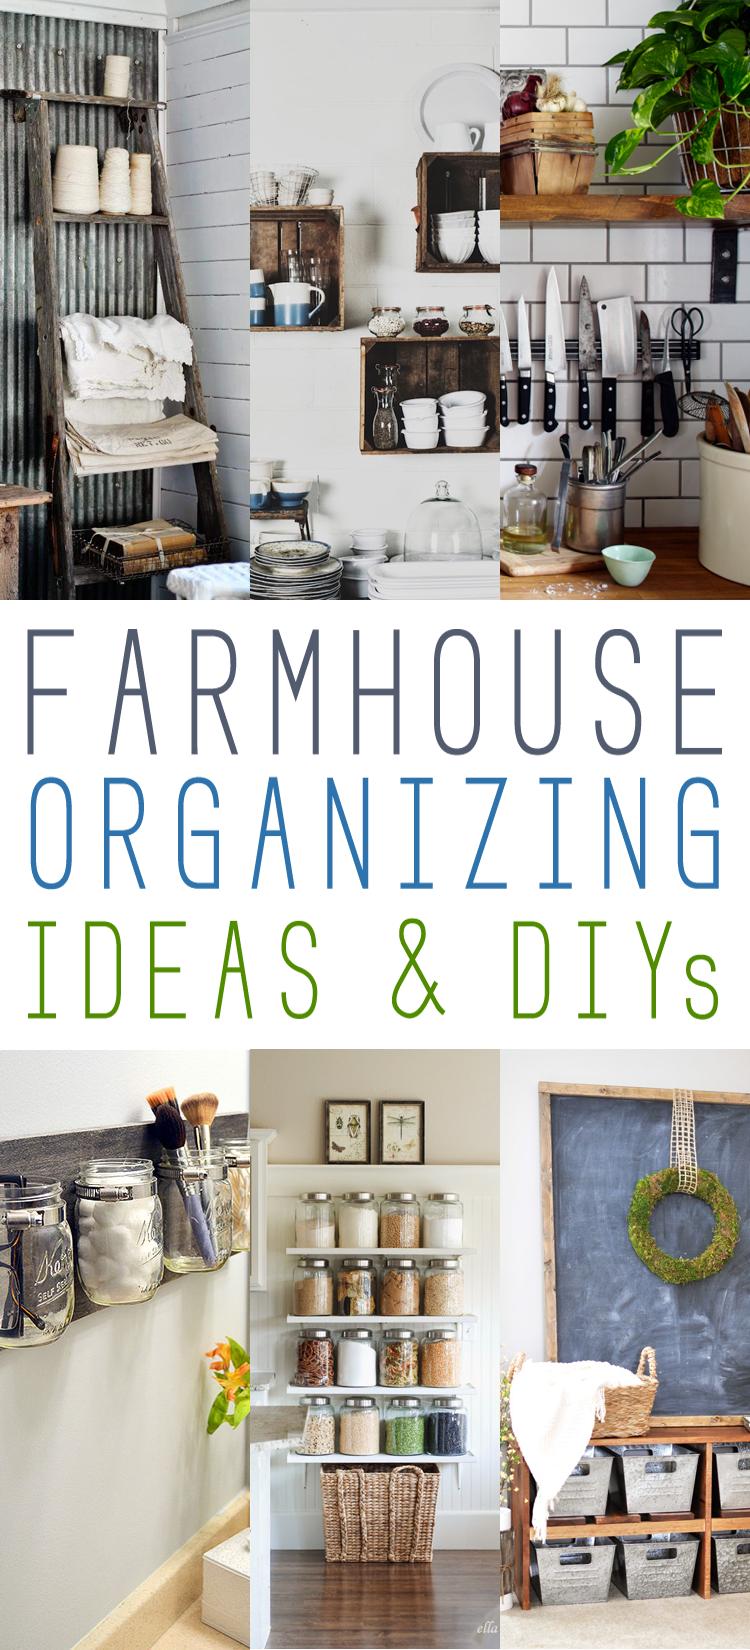 Farmhouse Decor Clean Crisp Organized Farmhouse: Fresh Farmhouse Storage Ideas And DIYs